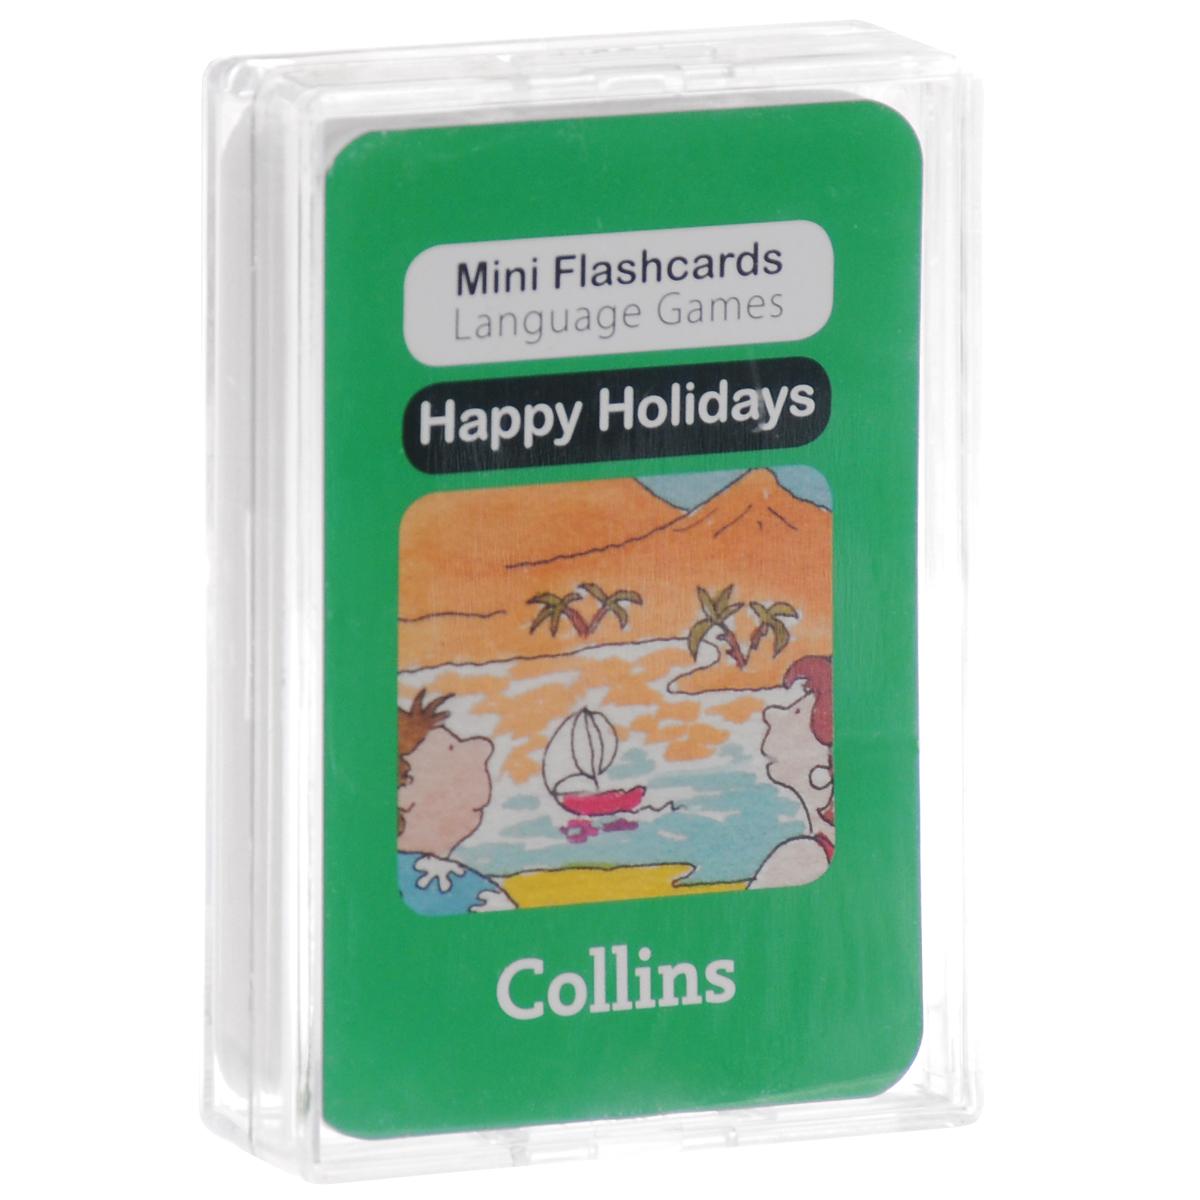 Happy Holidays (набор из 40 карточек) little friends flashcards набор из 21 карточки